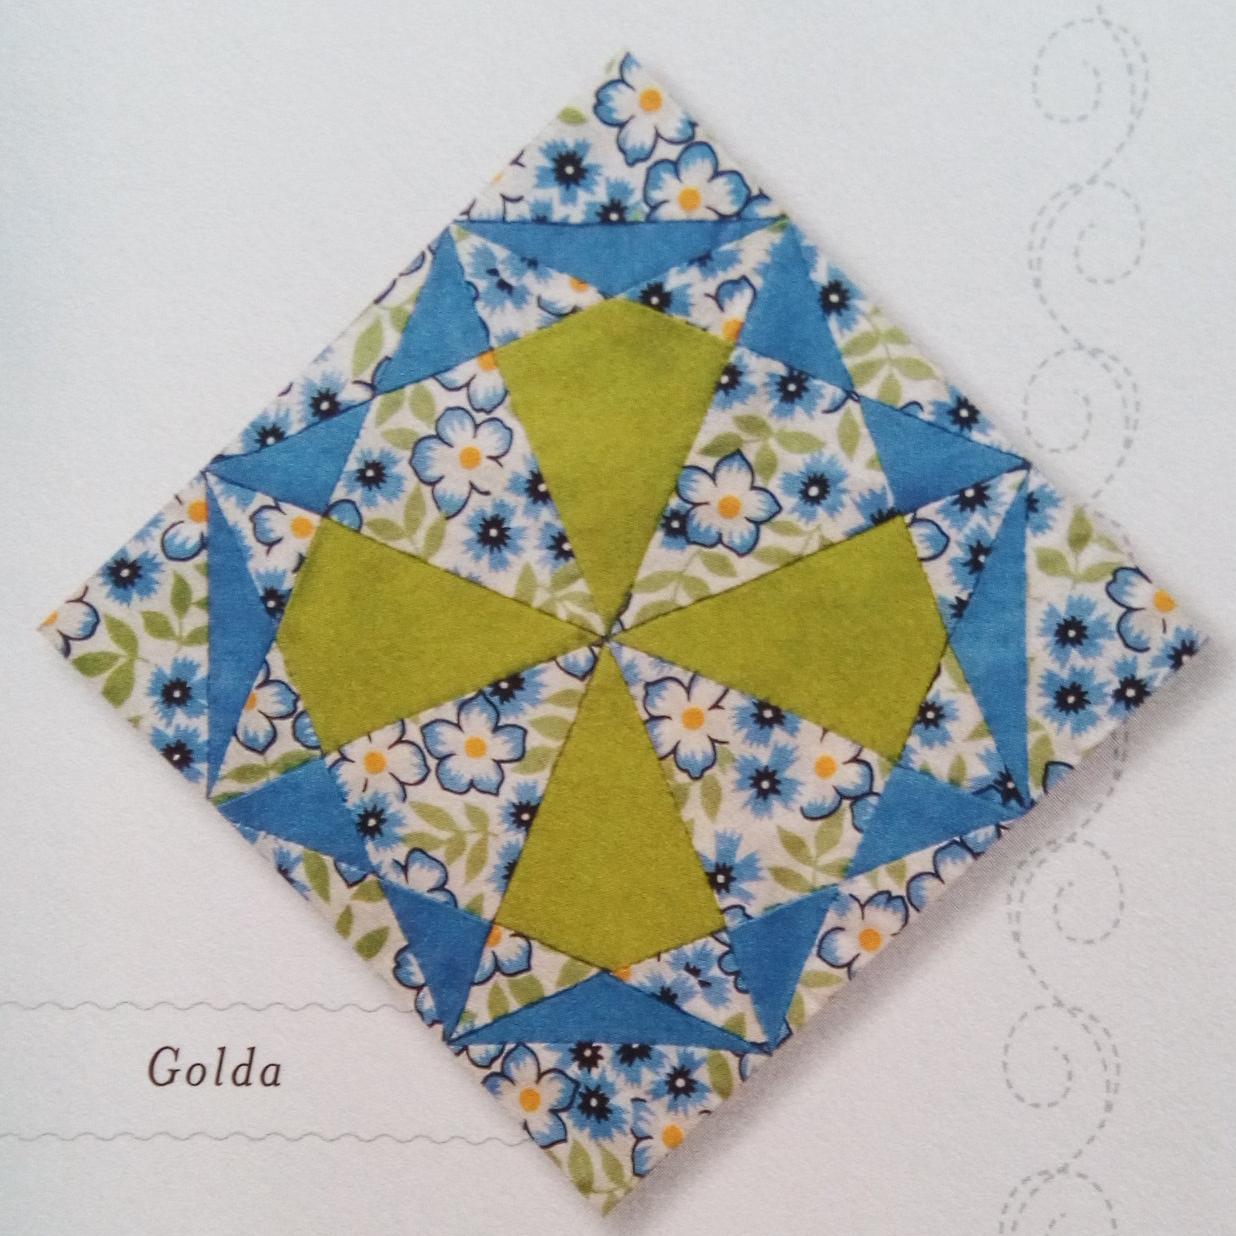 Golda: Coming September 7